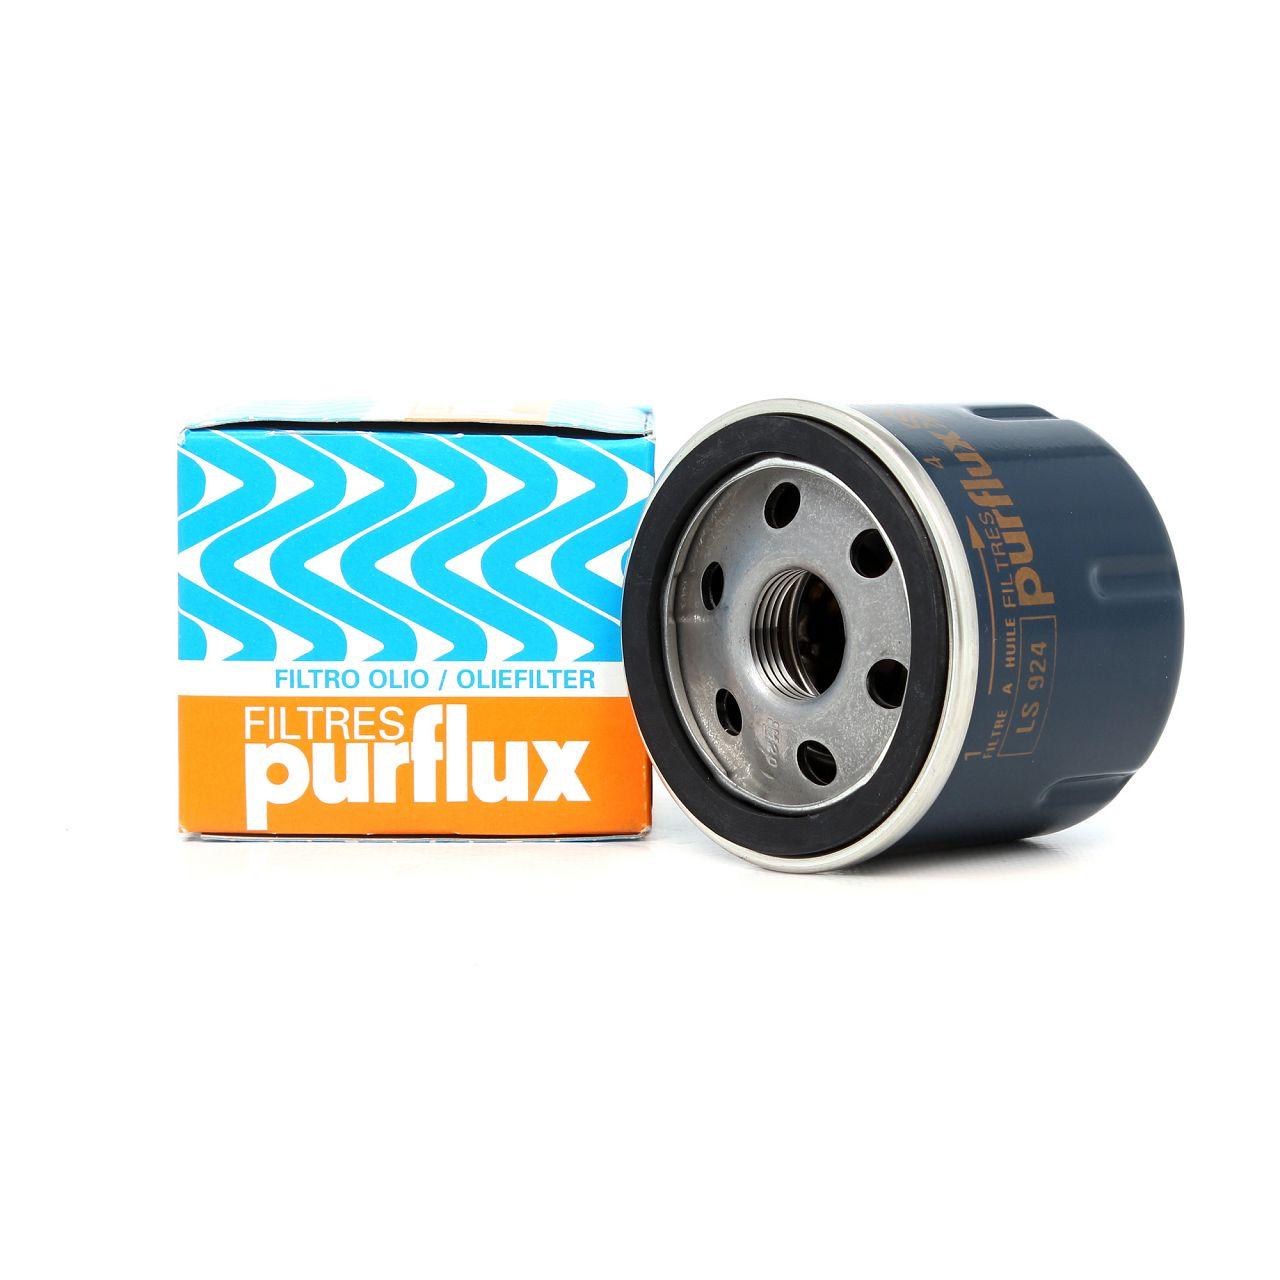 PURFLUX Ölfilter LS924 für RENAULT CLIO / KANGOO / TWINGO / MODUS 1.2 / 1.2 16V